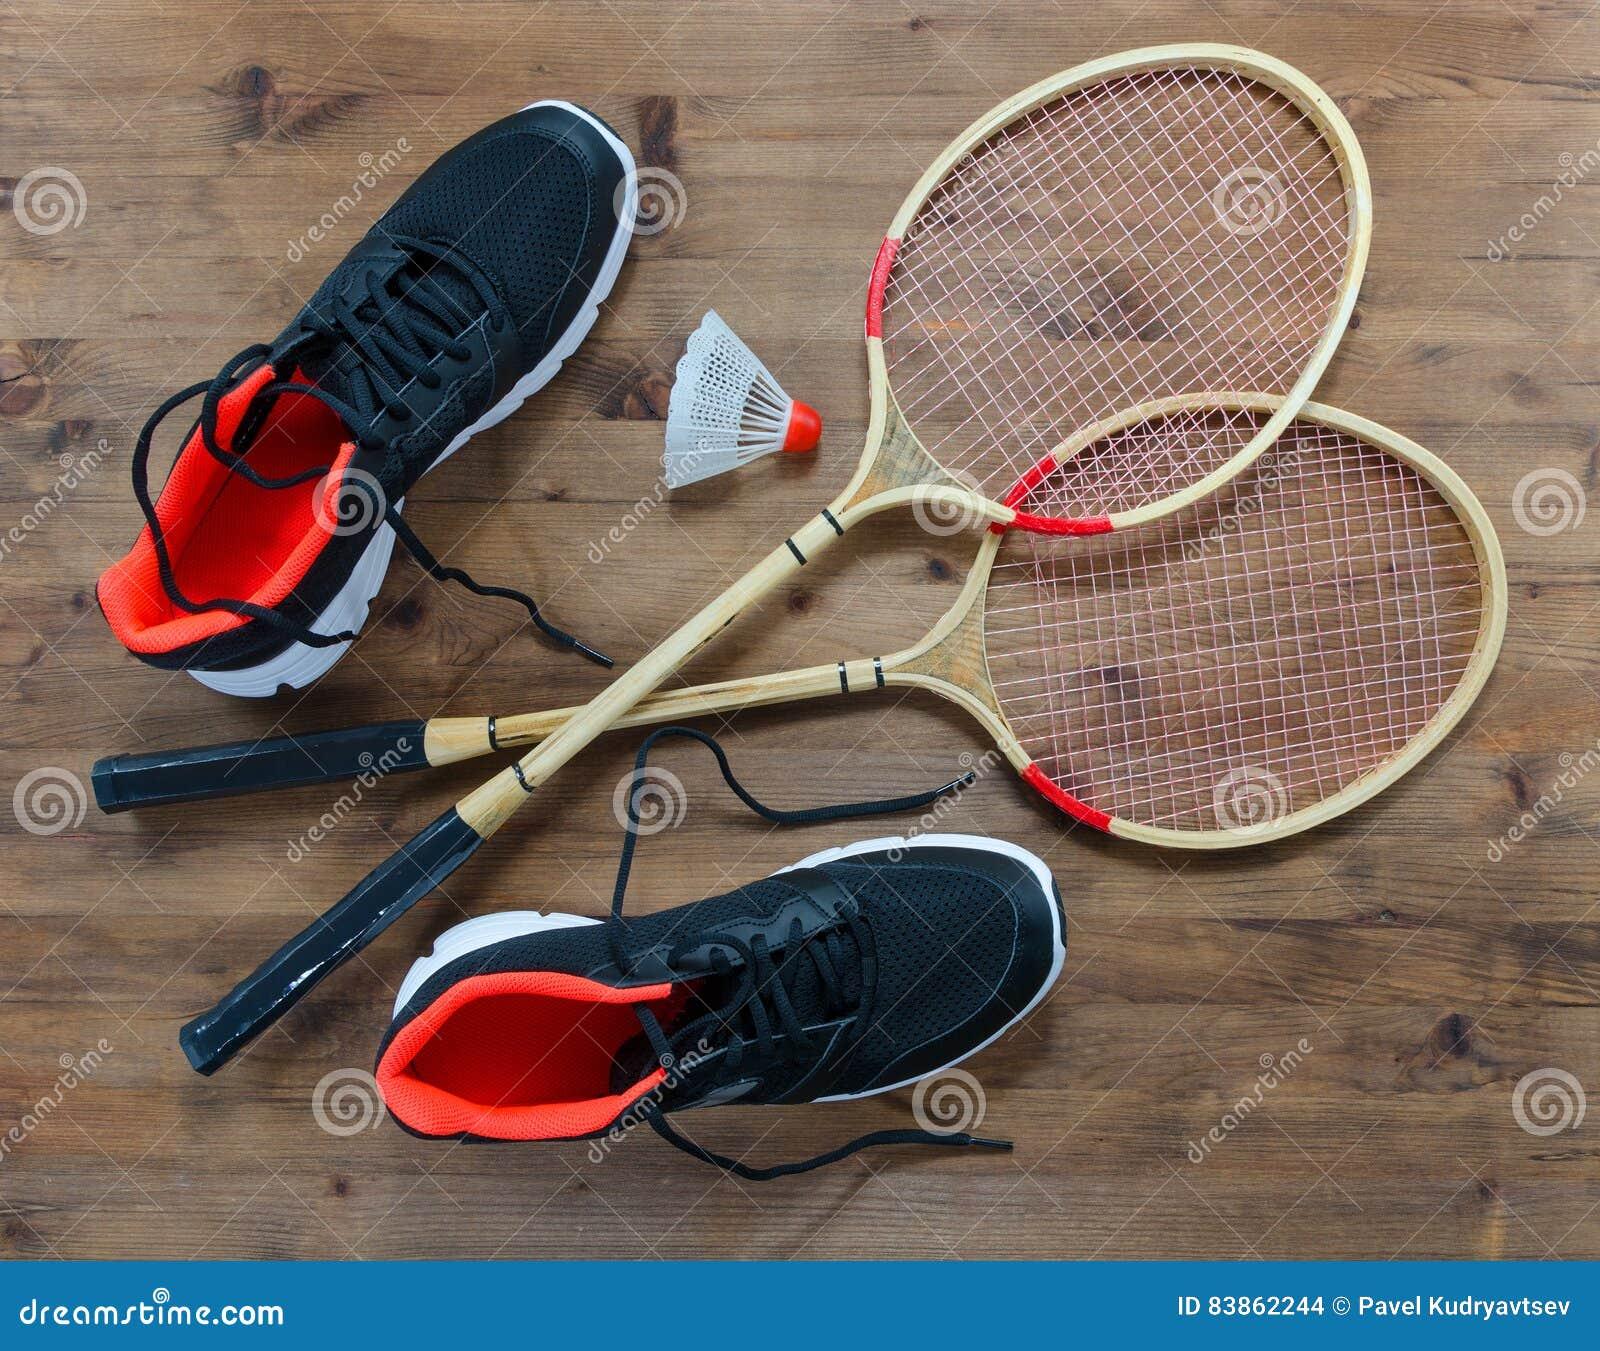 Shoes For Badminton Wooden Court